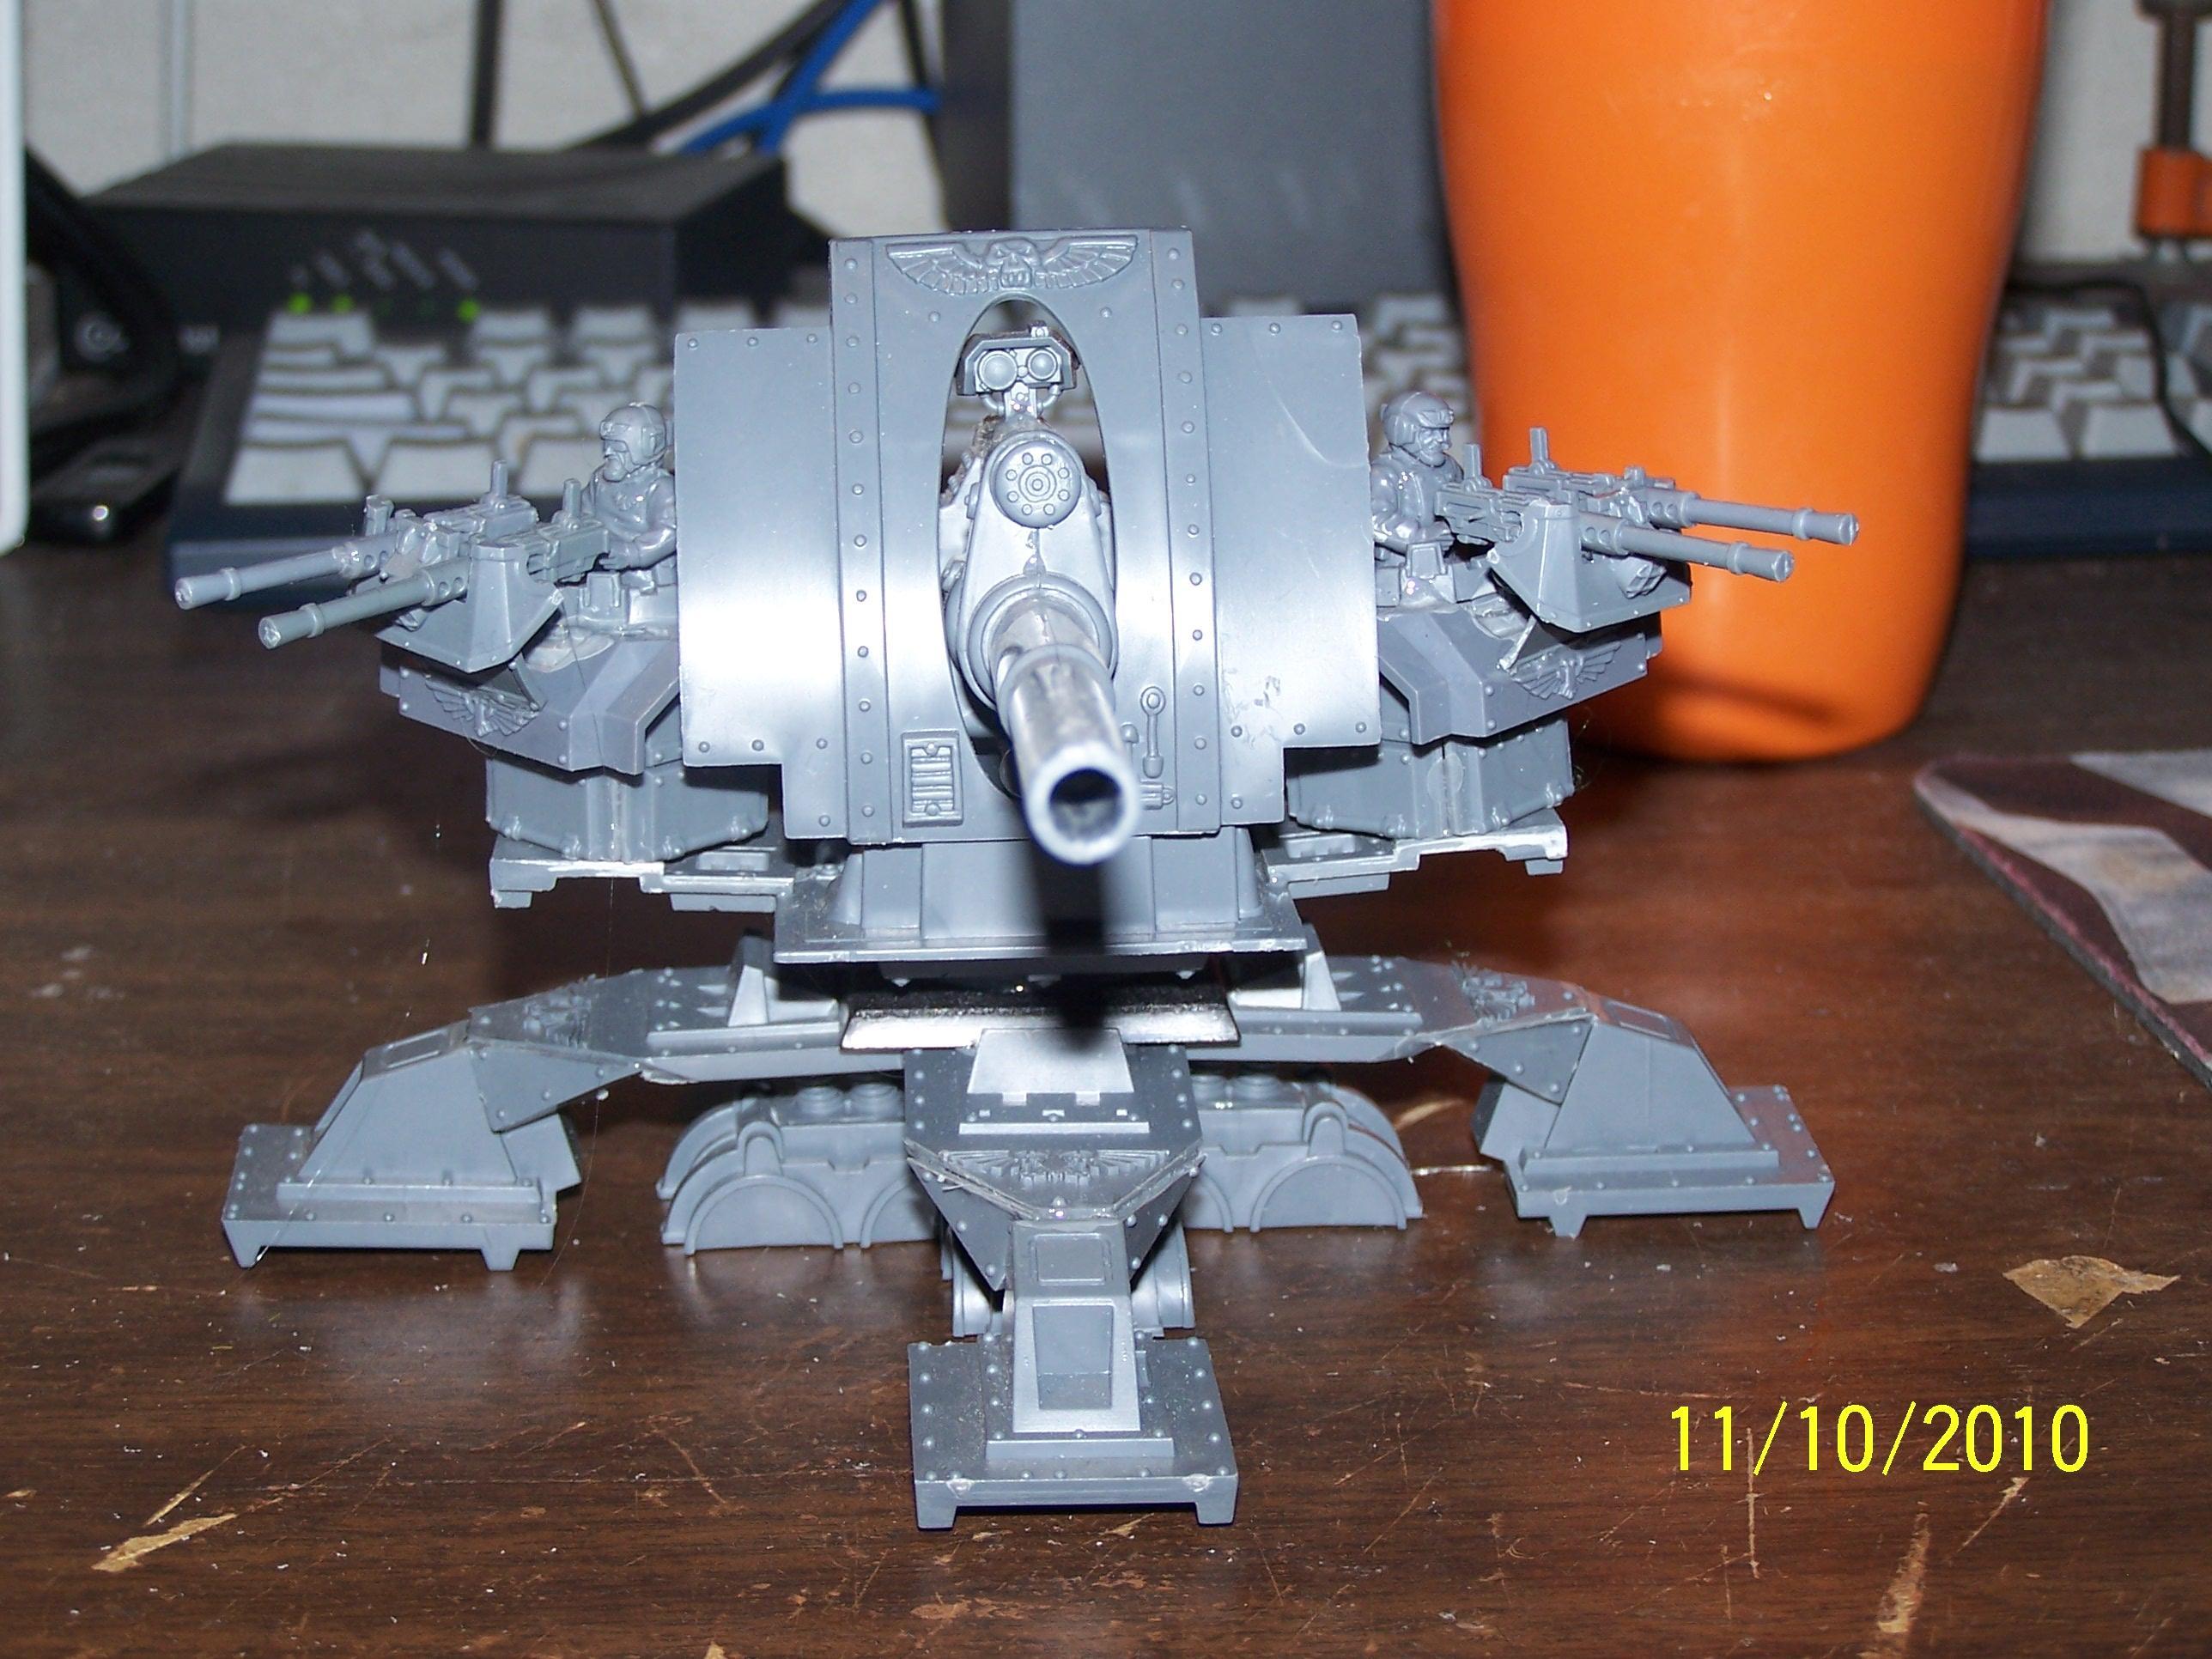 Basilisk, Imperial Guard, Warhammer 40,000